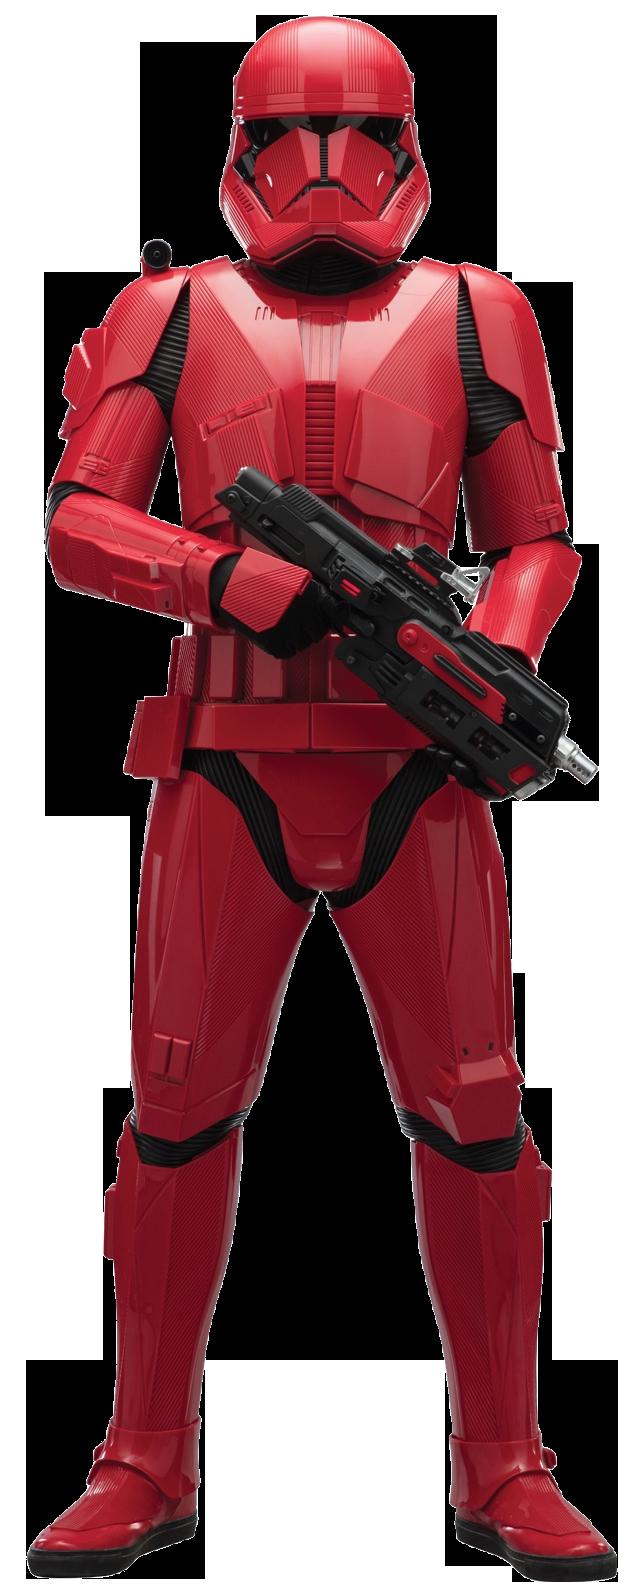 Sith Trooper Wookieepedia Fandom